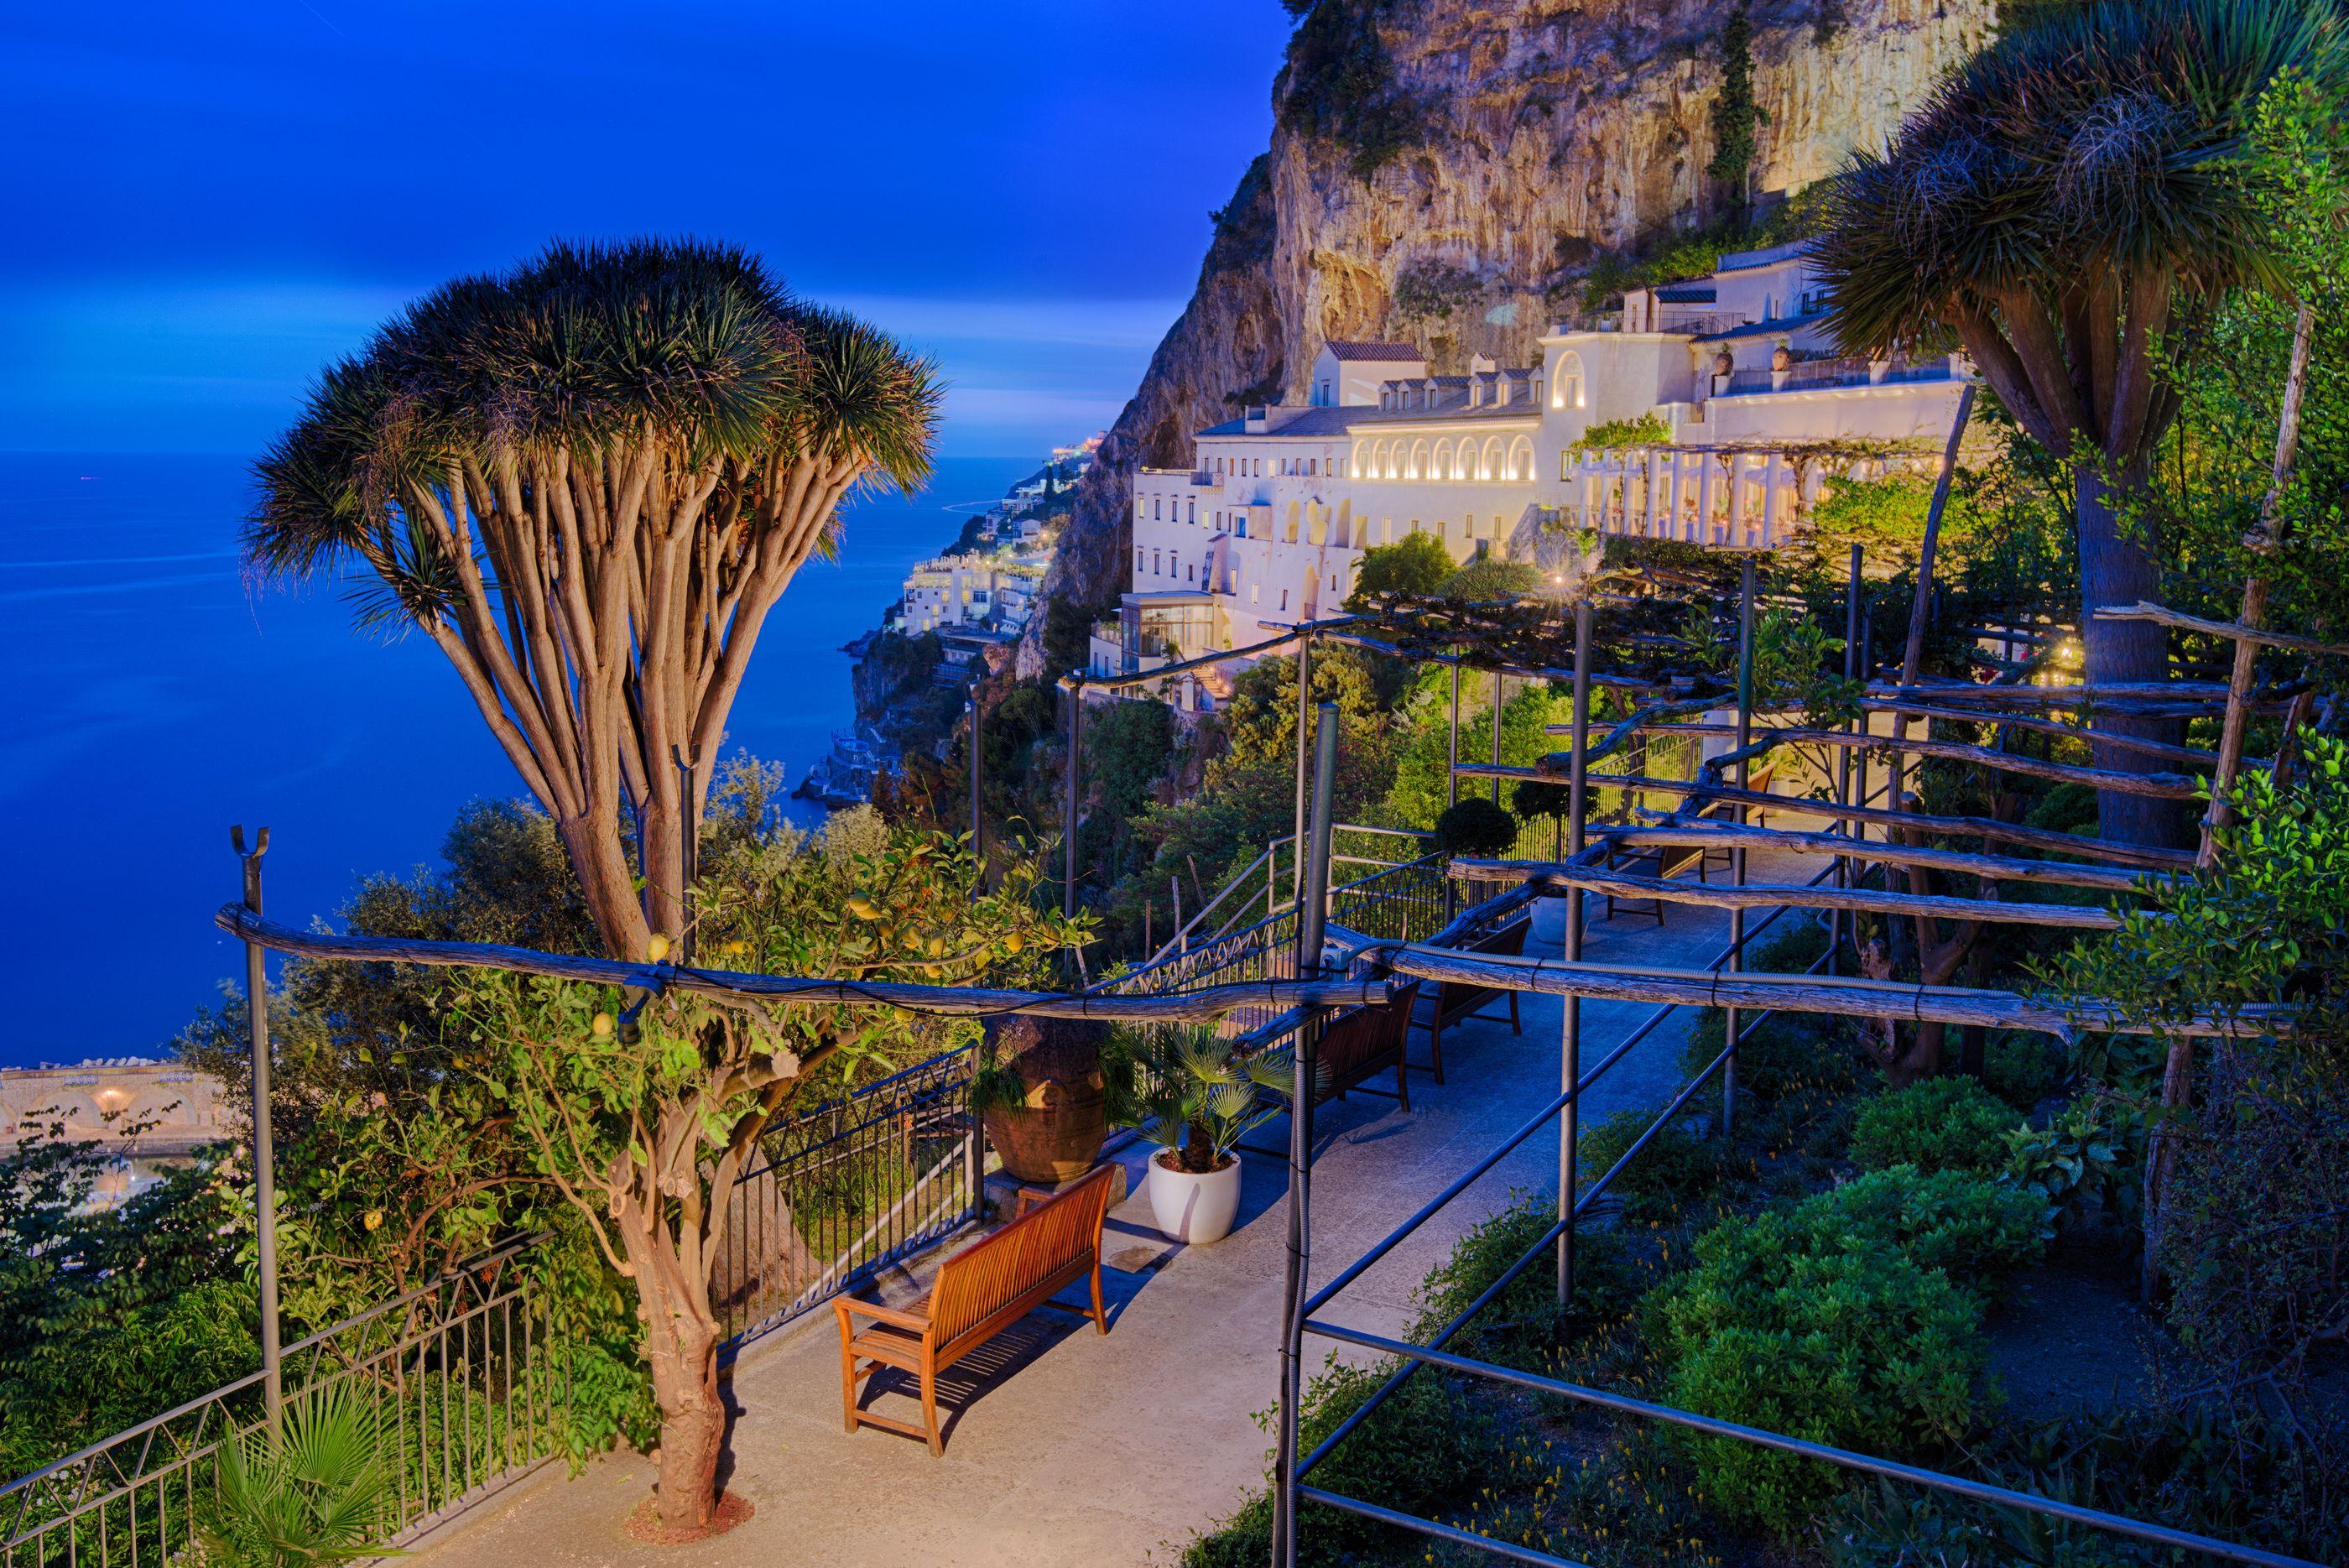 Hotell Amalfi coast